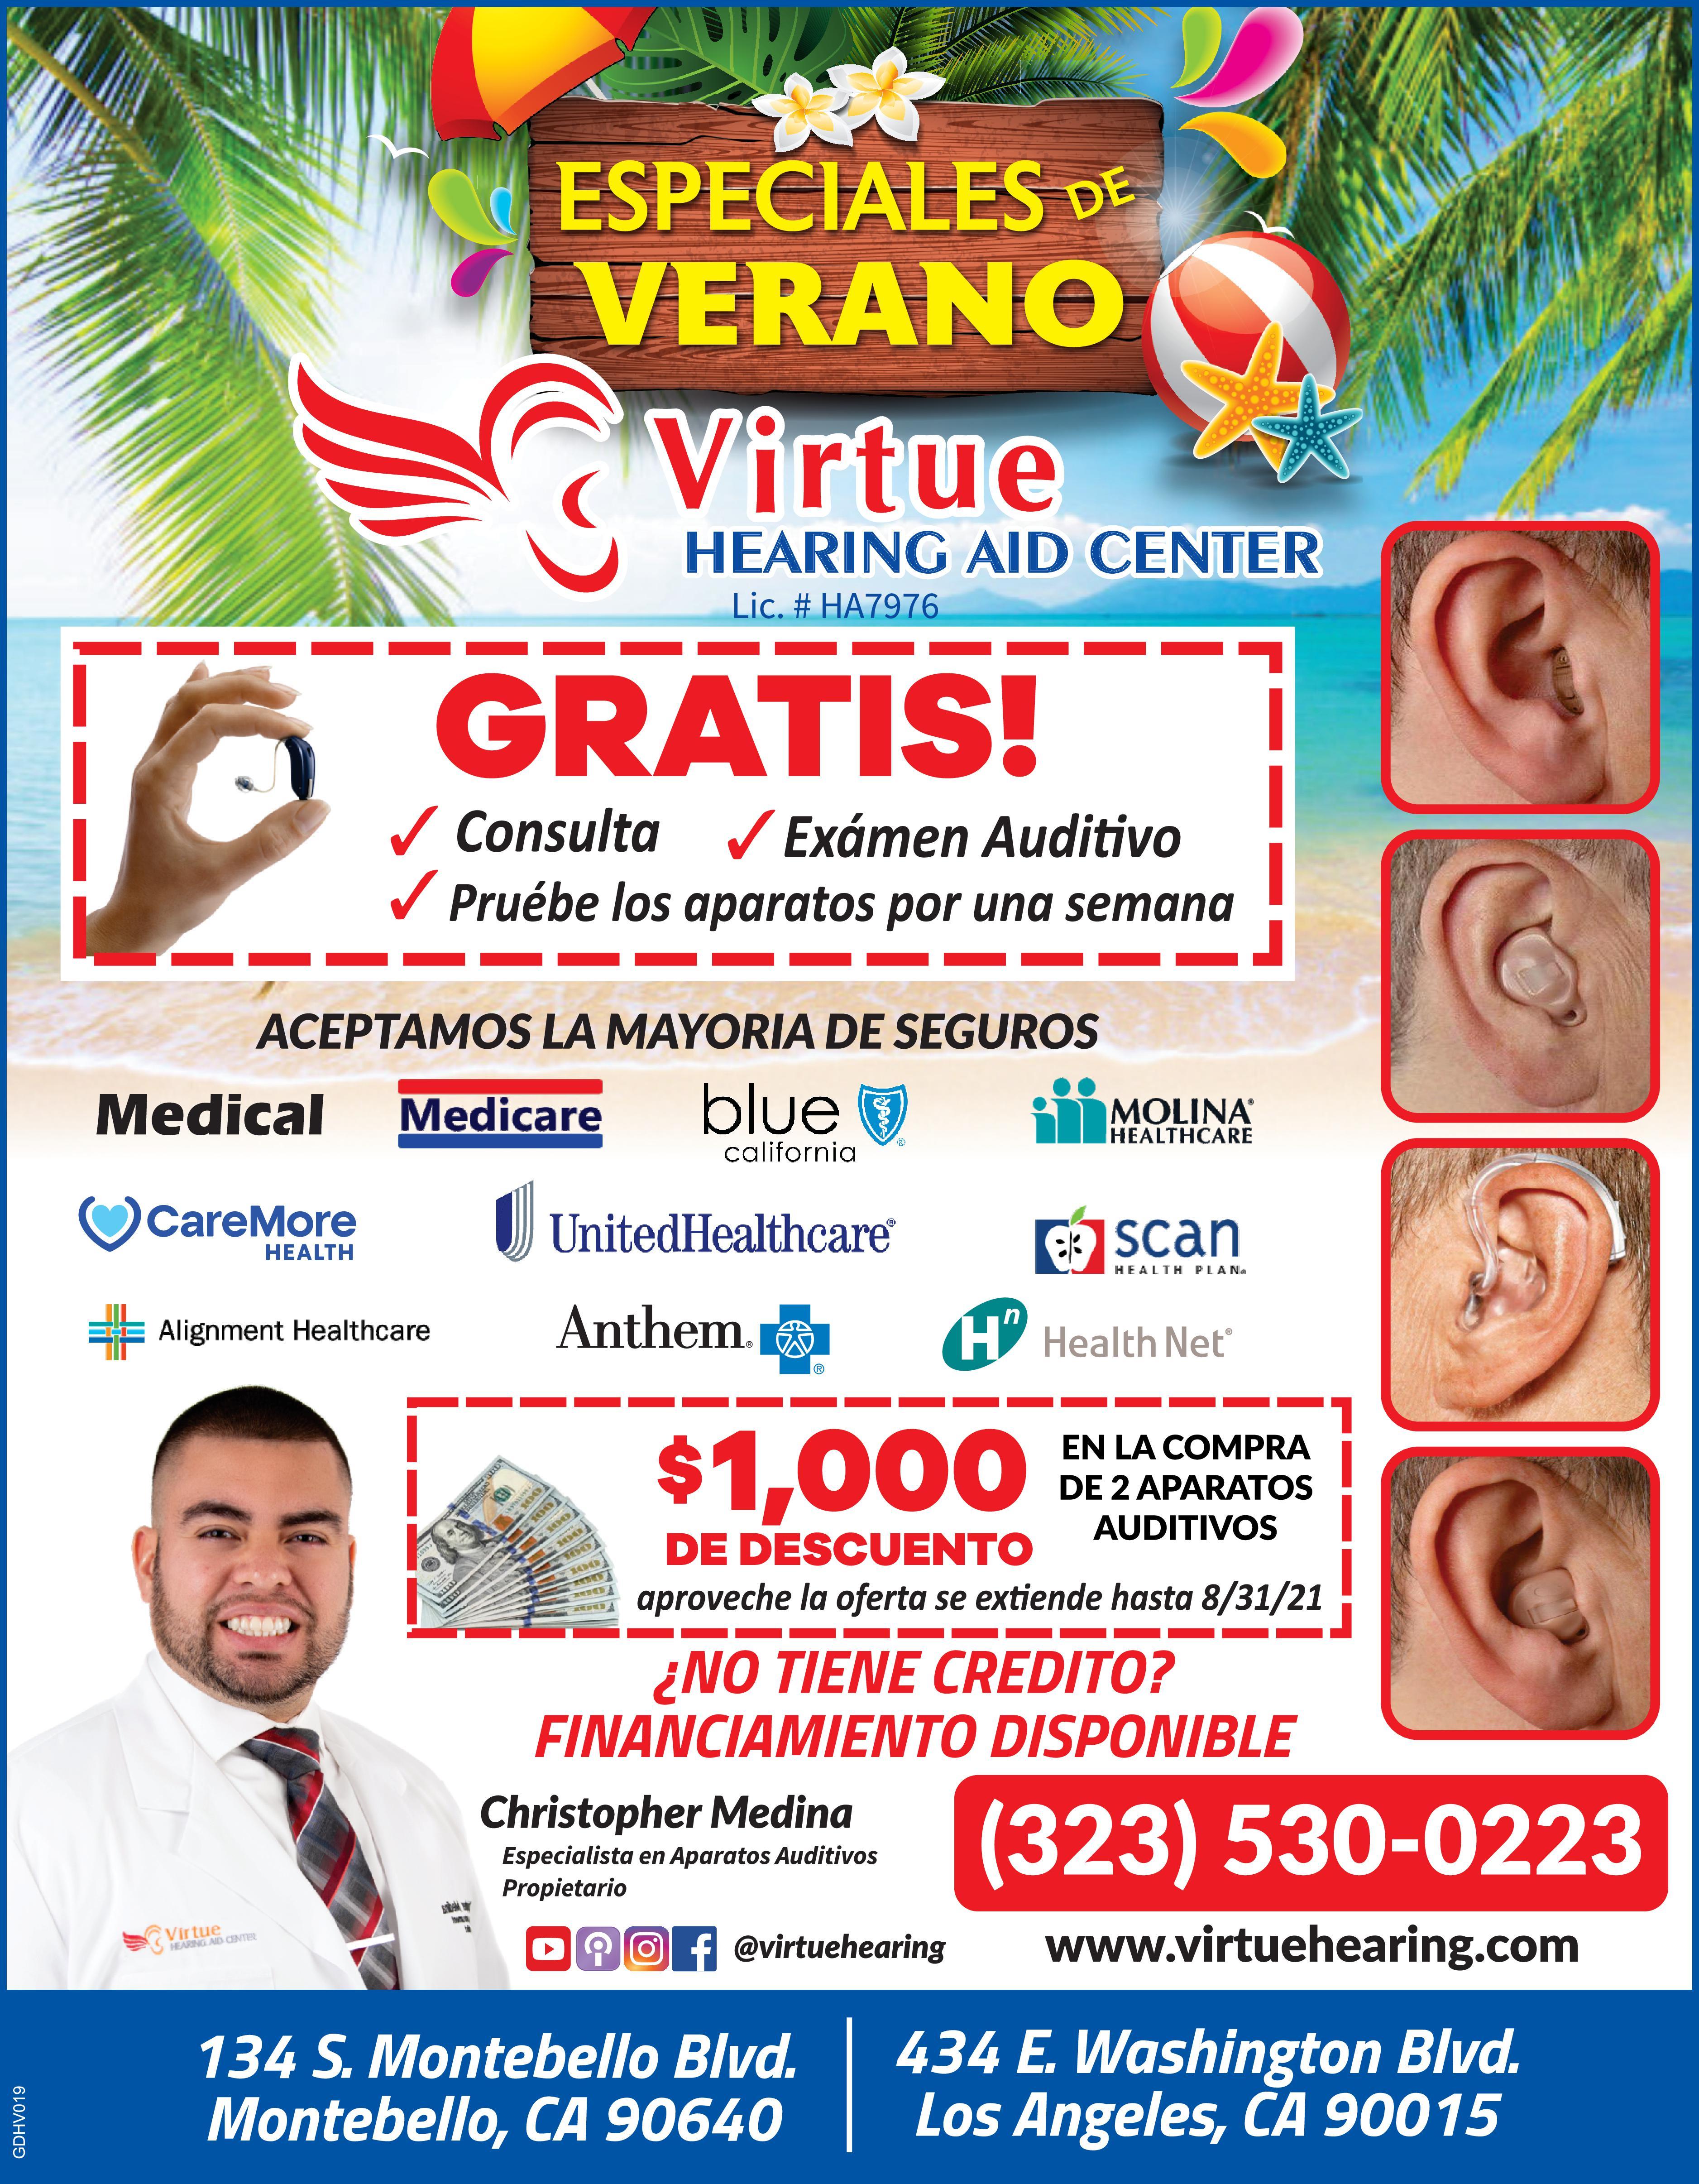 Virtue Hearing Aid Center